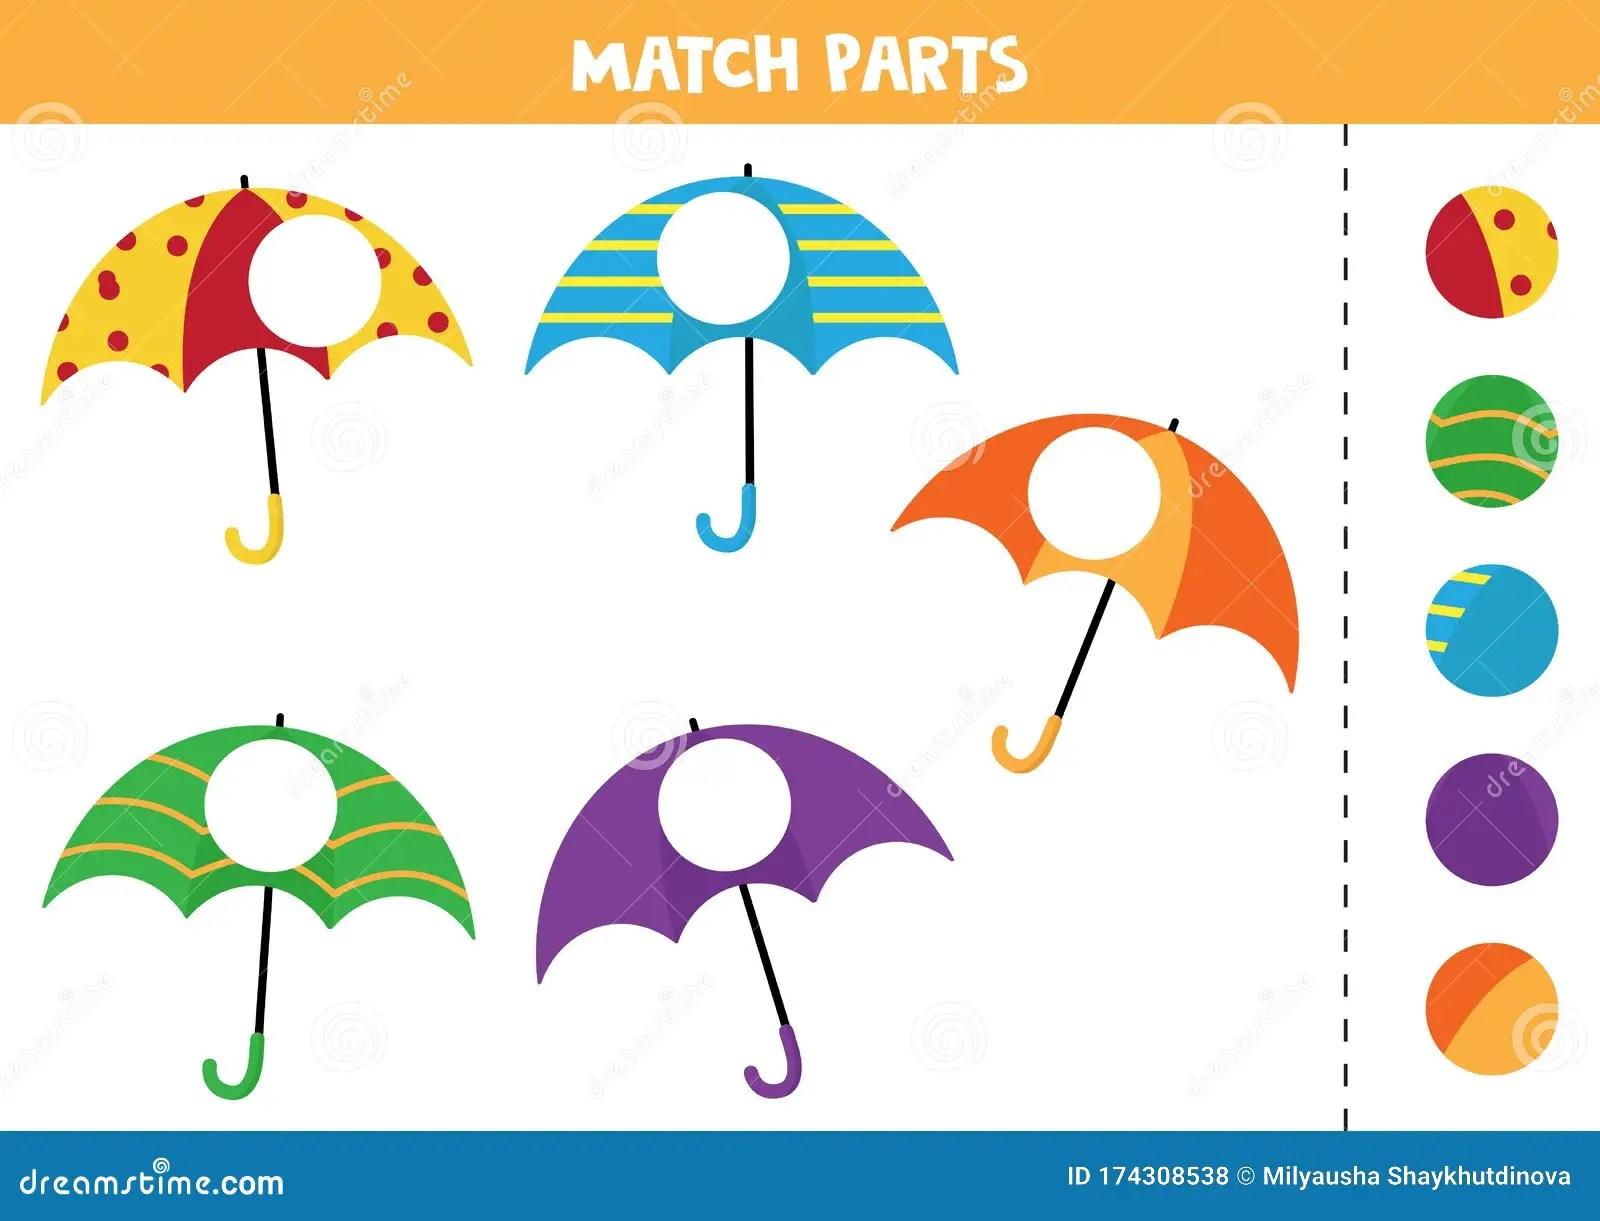 Educational Worksheet For Preschool Kids Match Parts Of